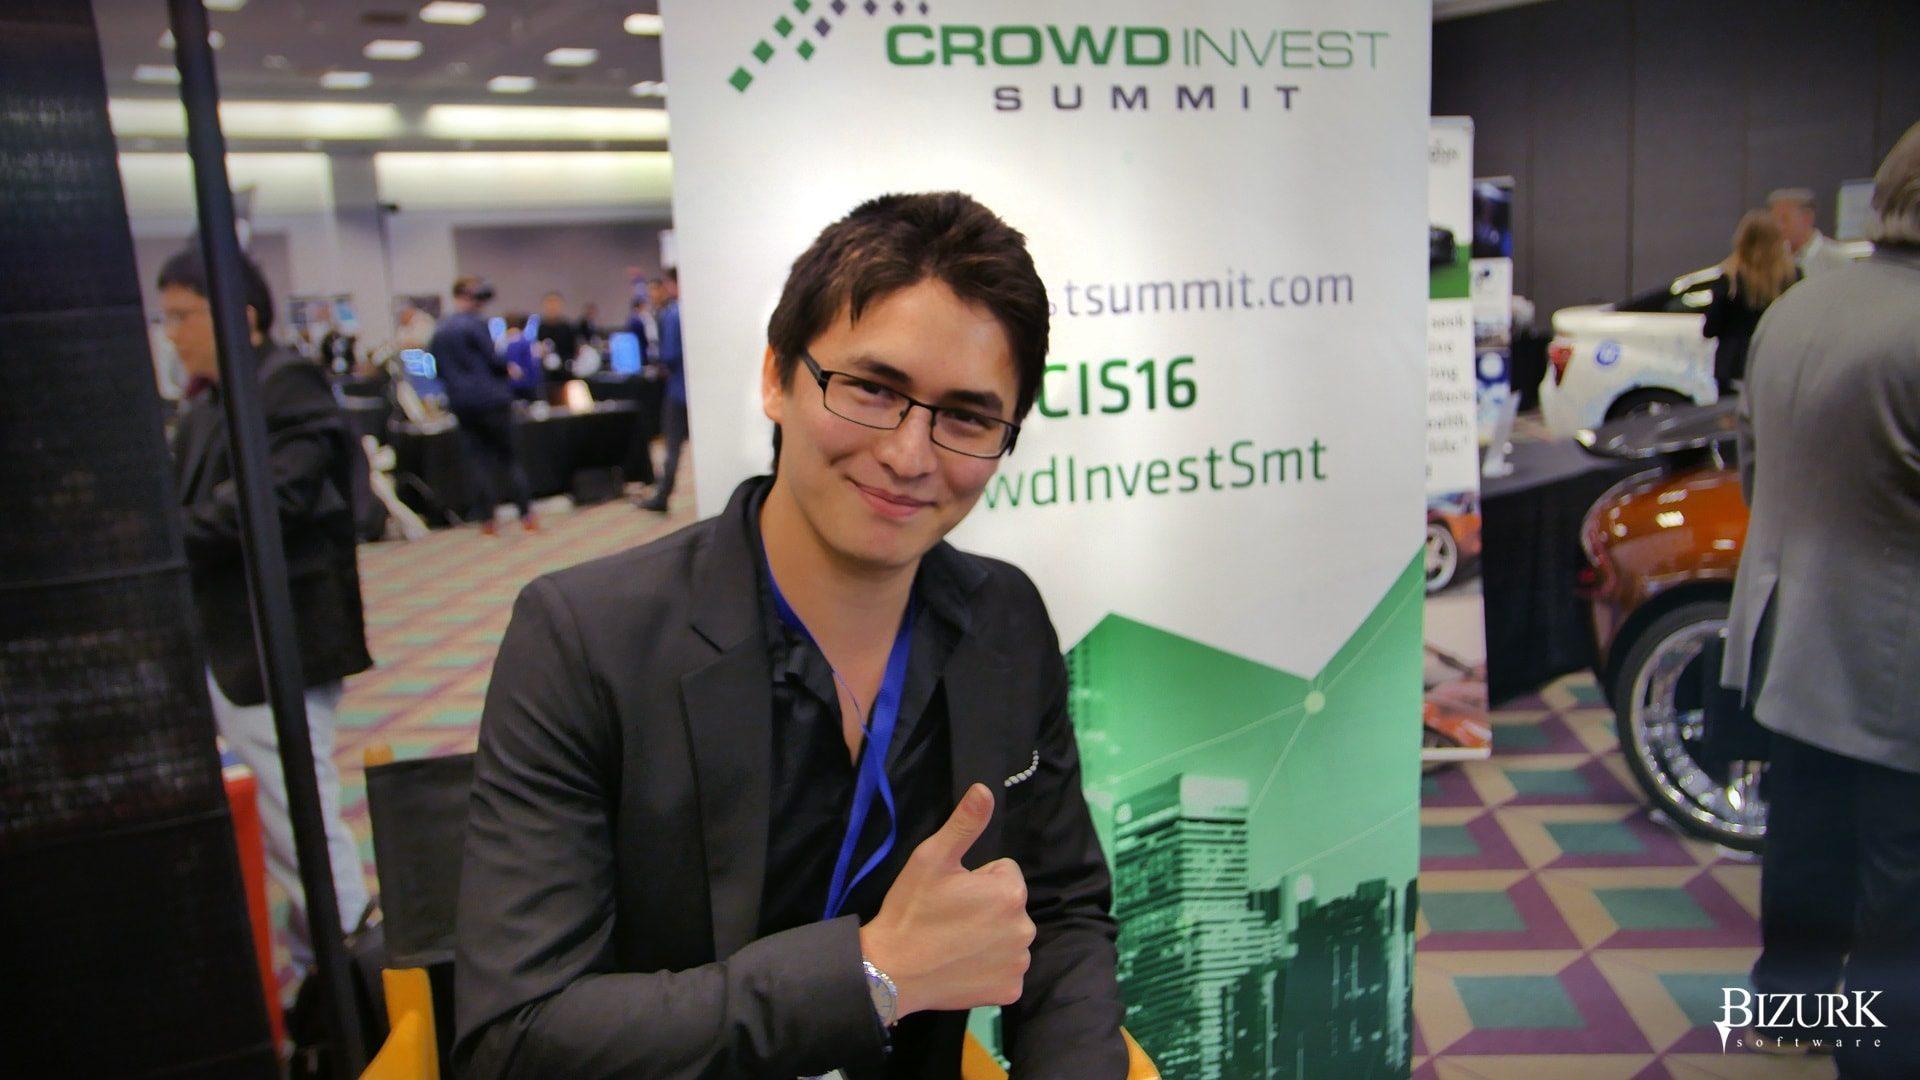 CrowdInvest 2-min